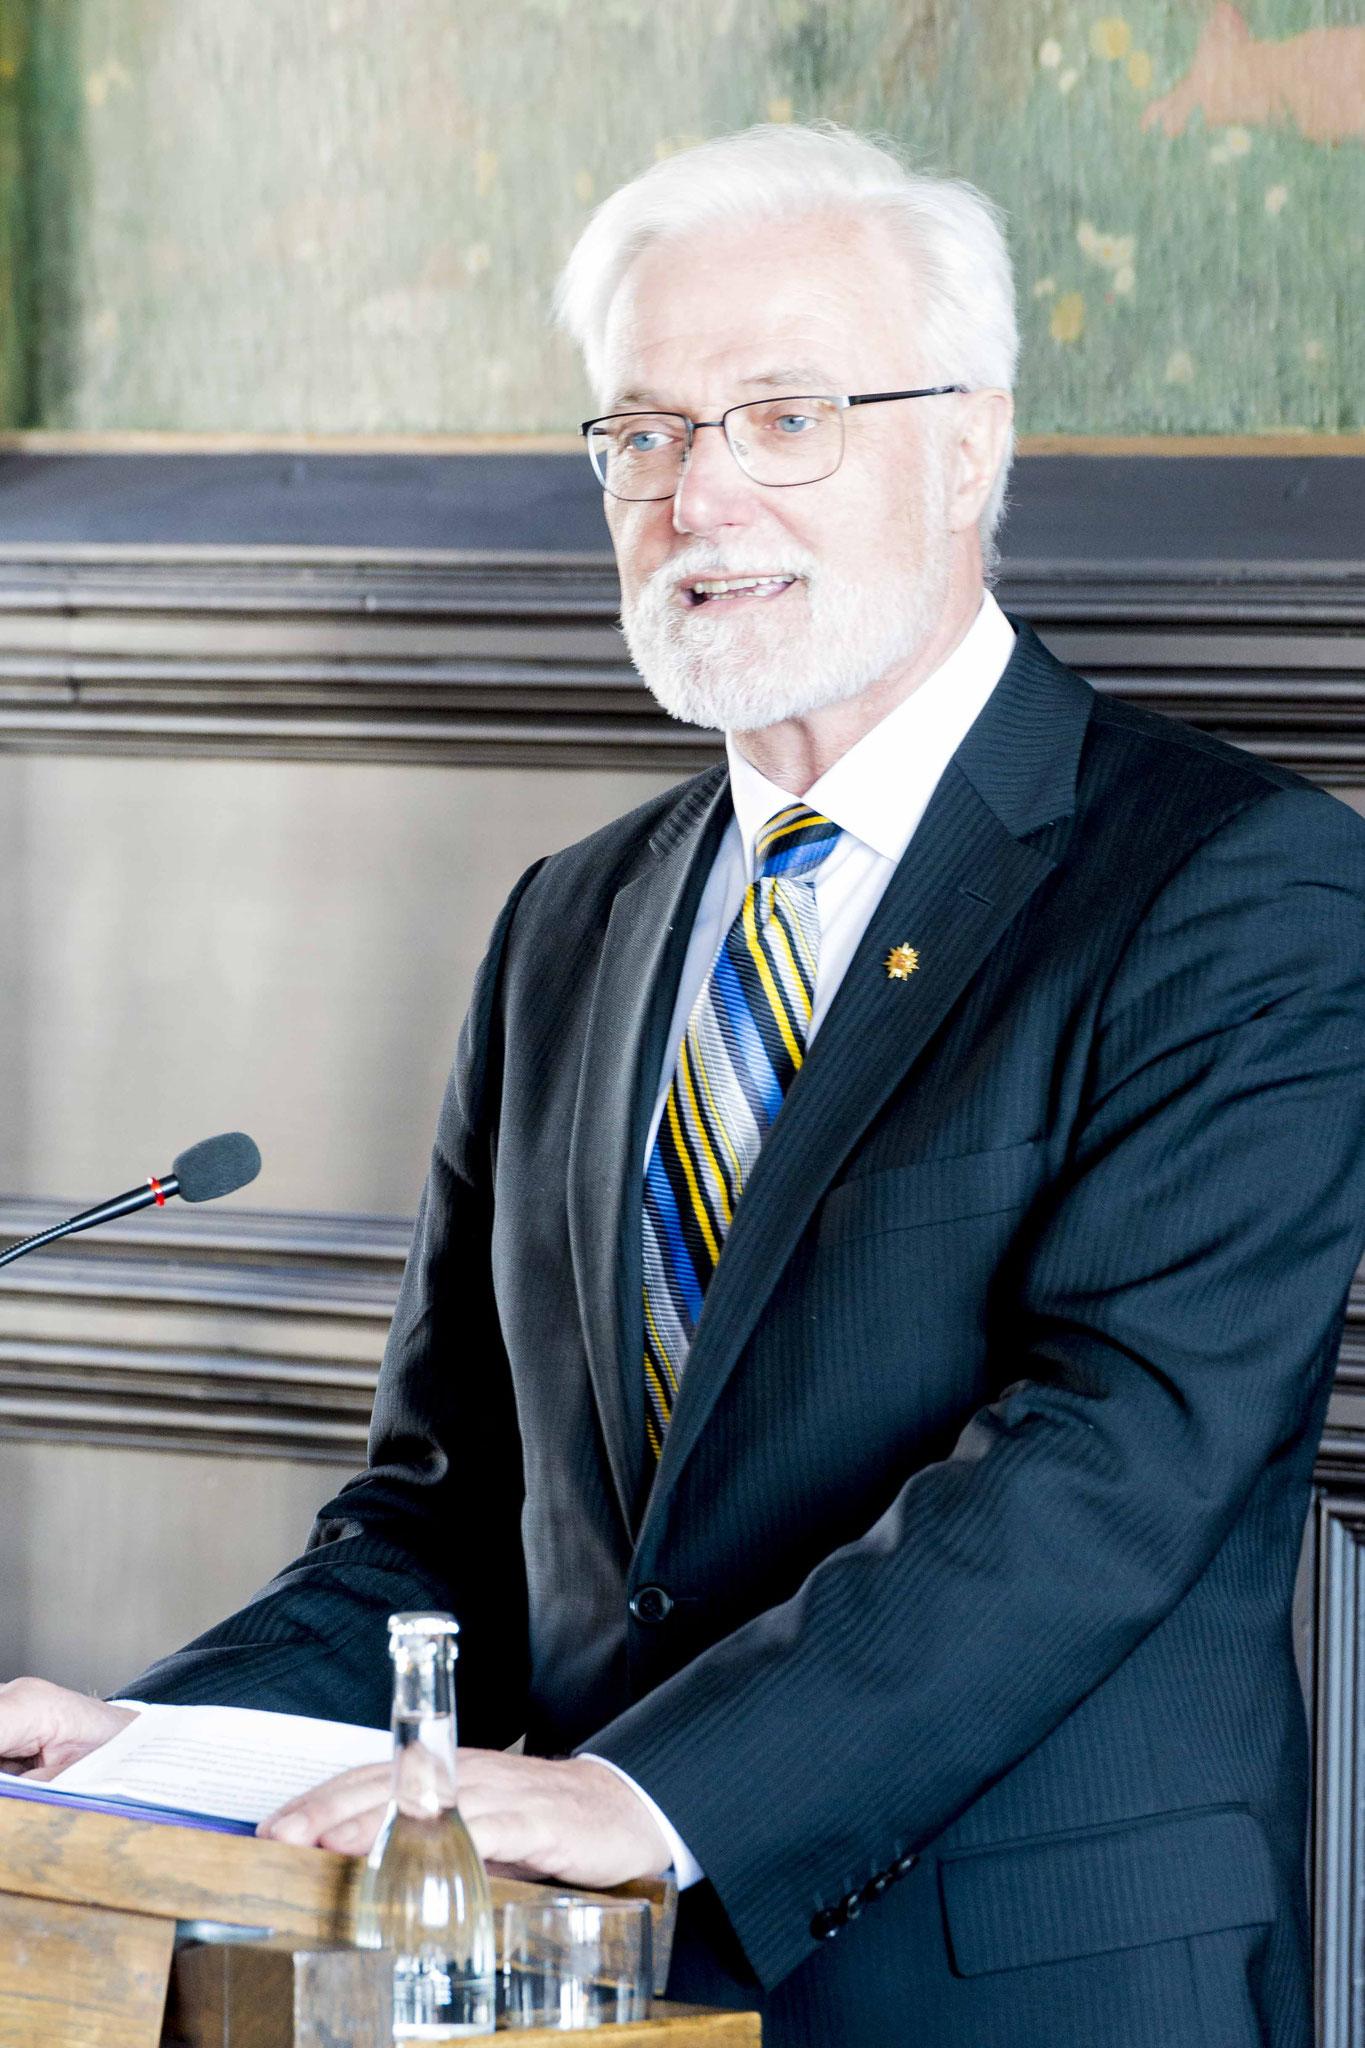 Ltd. Polizeipfarrer Wolfgang Hinz